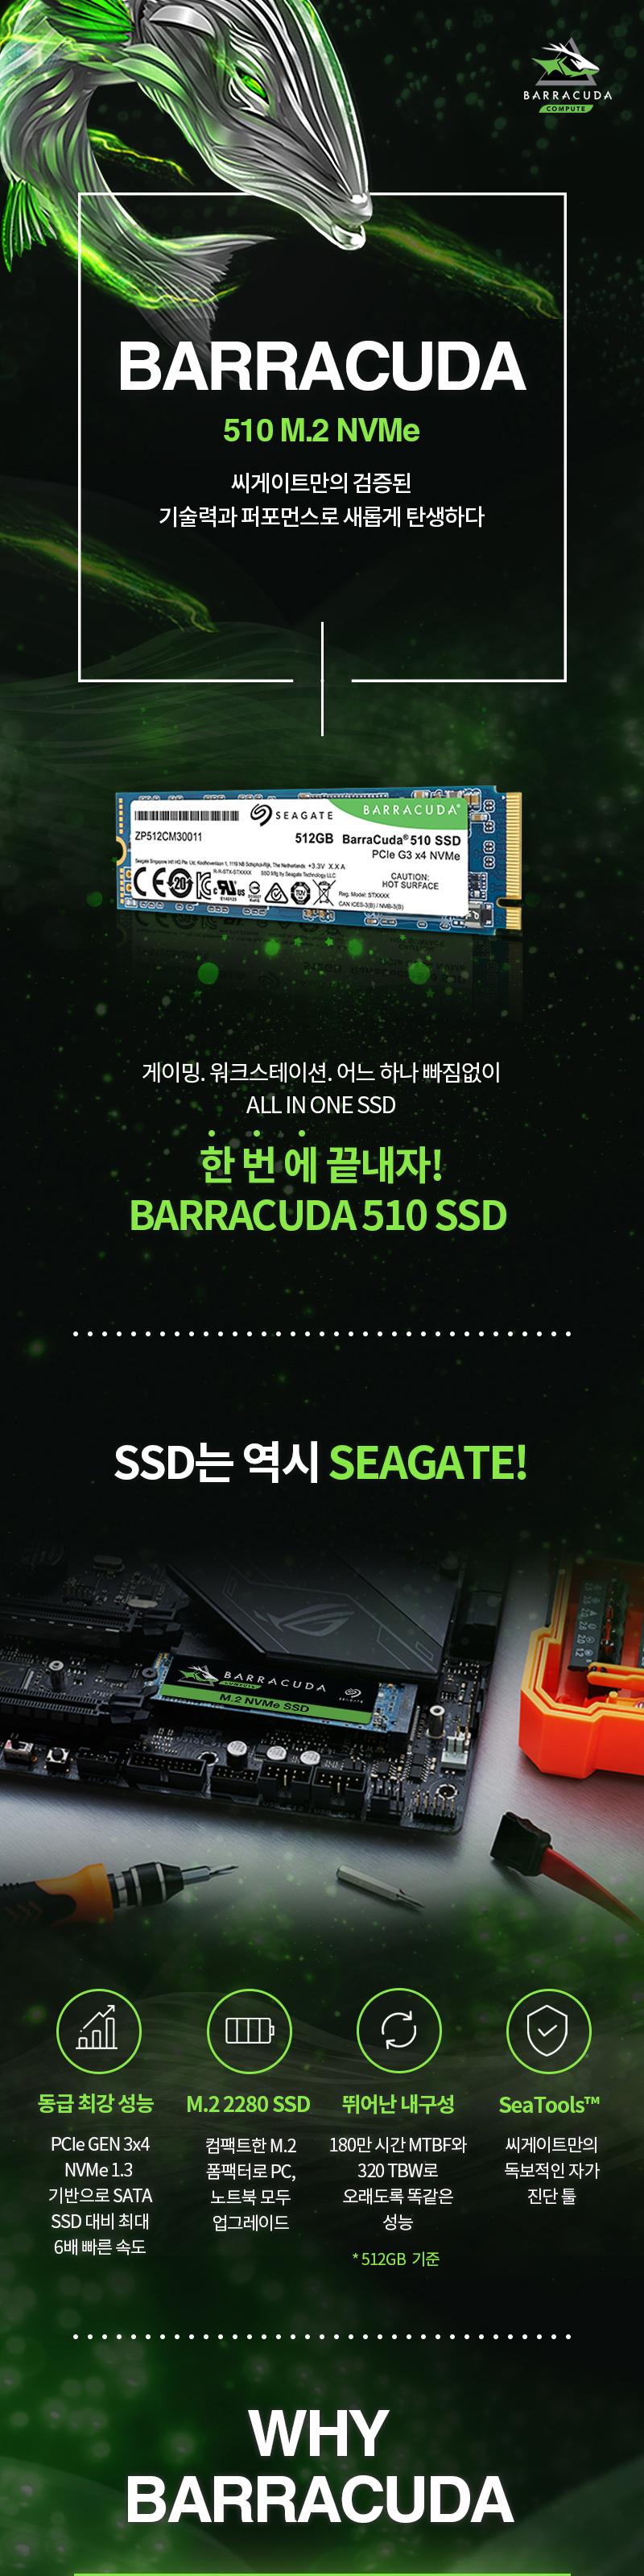 Seagate 바라쿠다 510 M.2 NVMe (256GB)